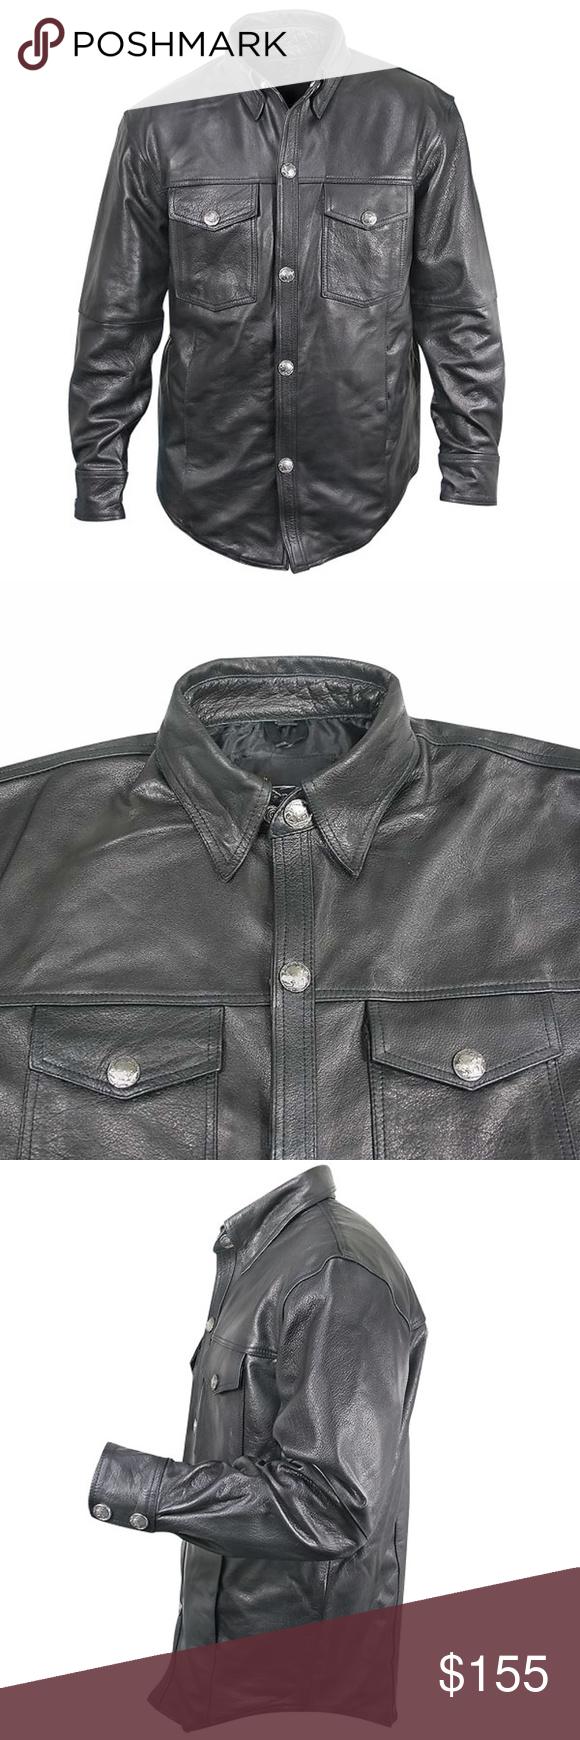 Xelement Xxl Men S Black Leather Shirt Buffalo Earthy Buffalo And